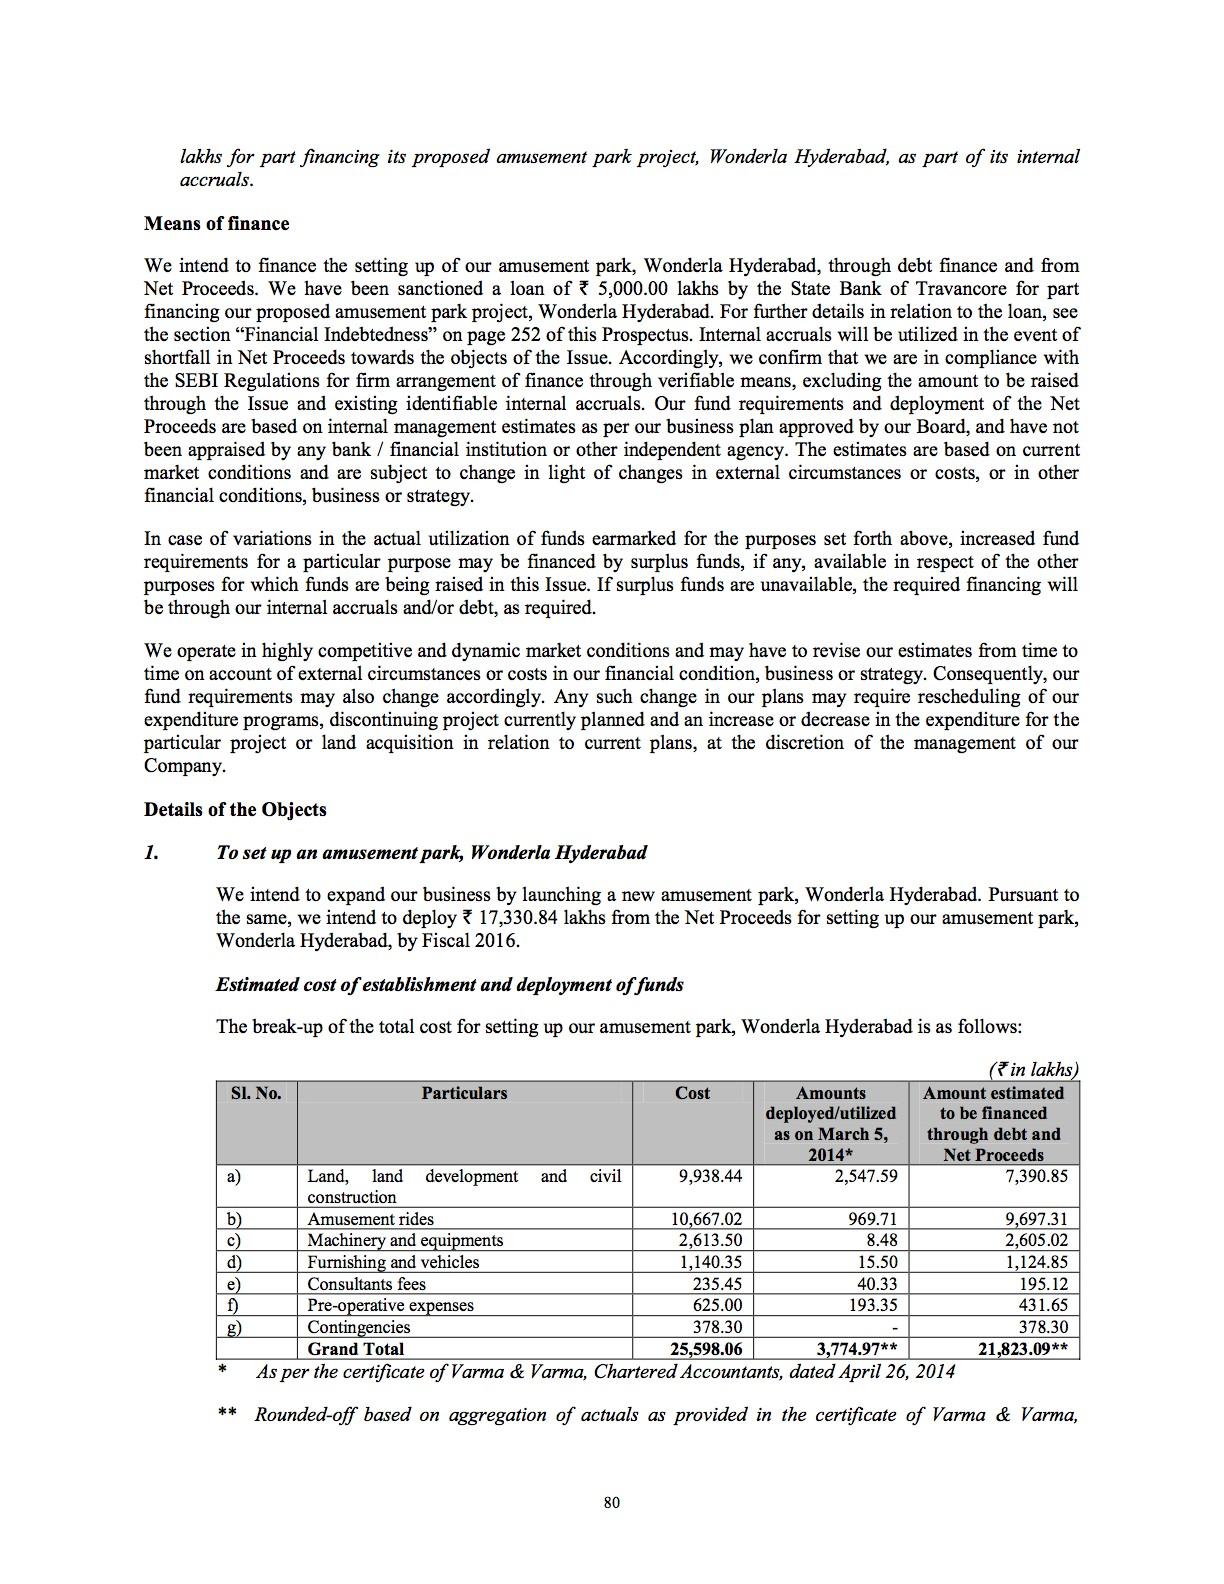 Funds needed for Wonderla Hyberdad shown in Wonderla Financial Report 2014